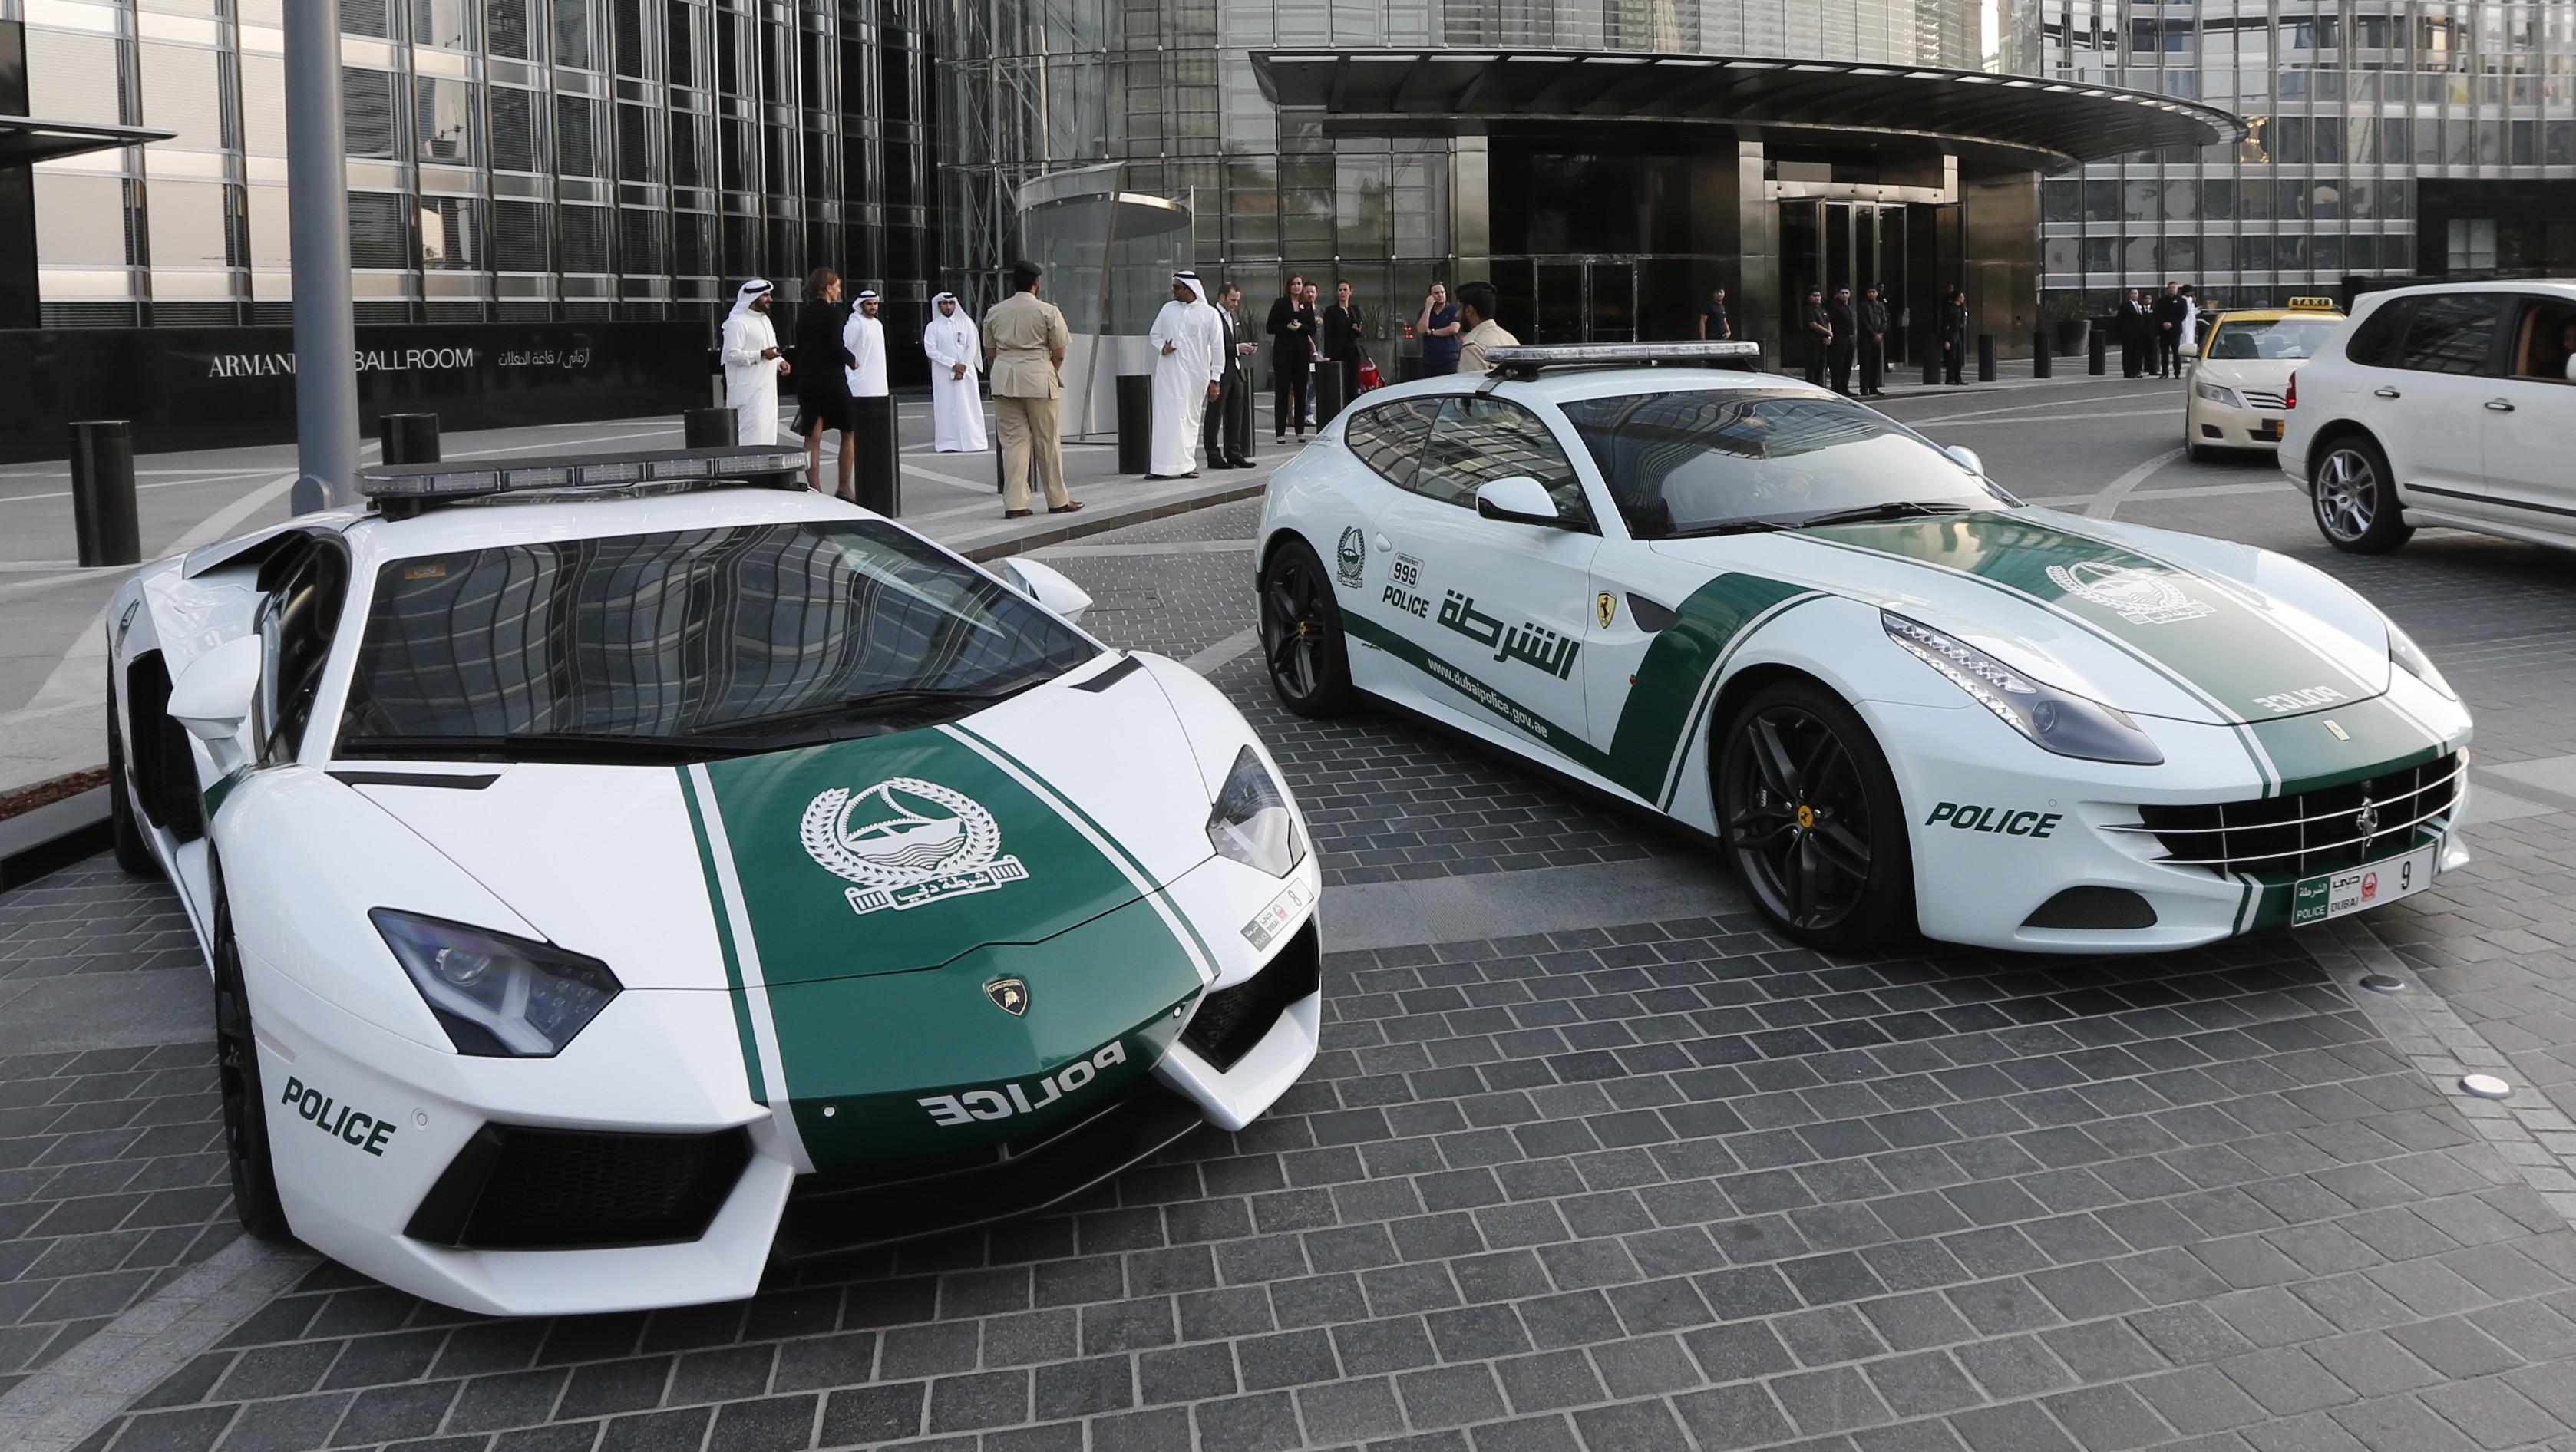 Дубай фото автомобилей приан дубай